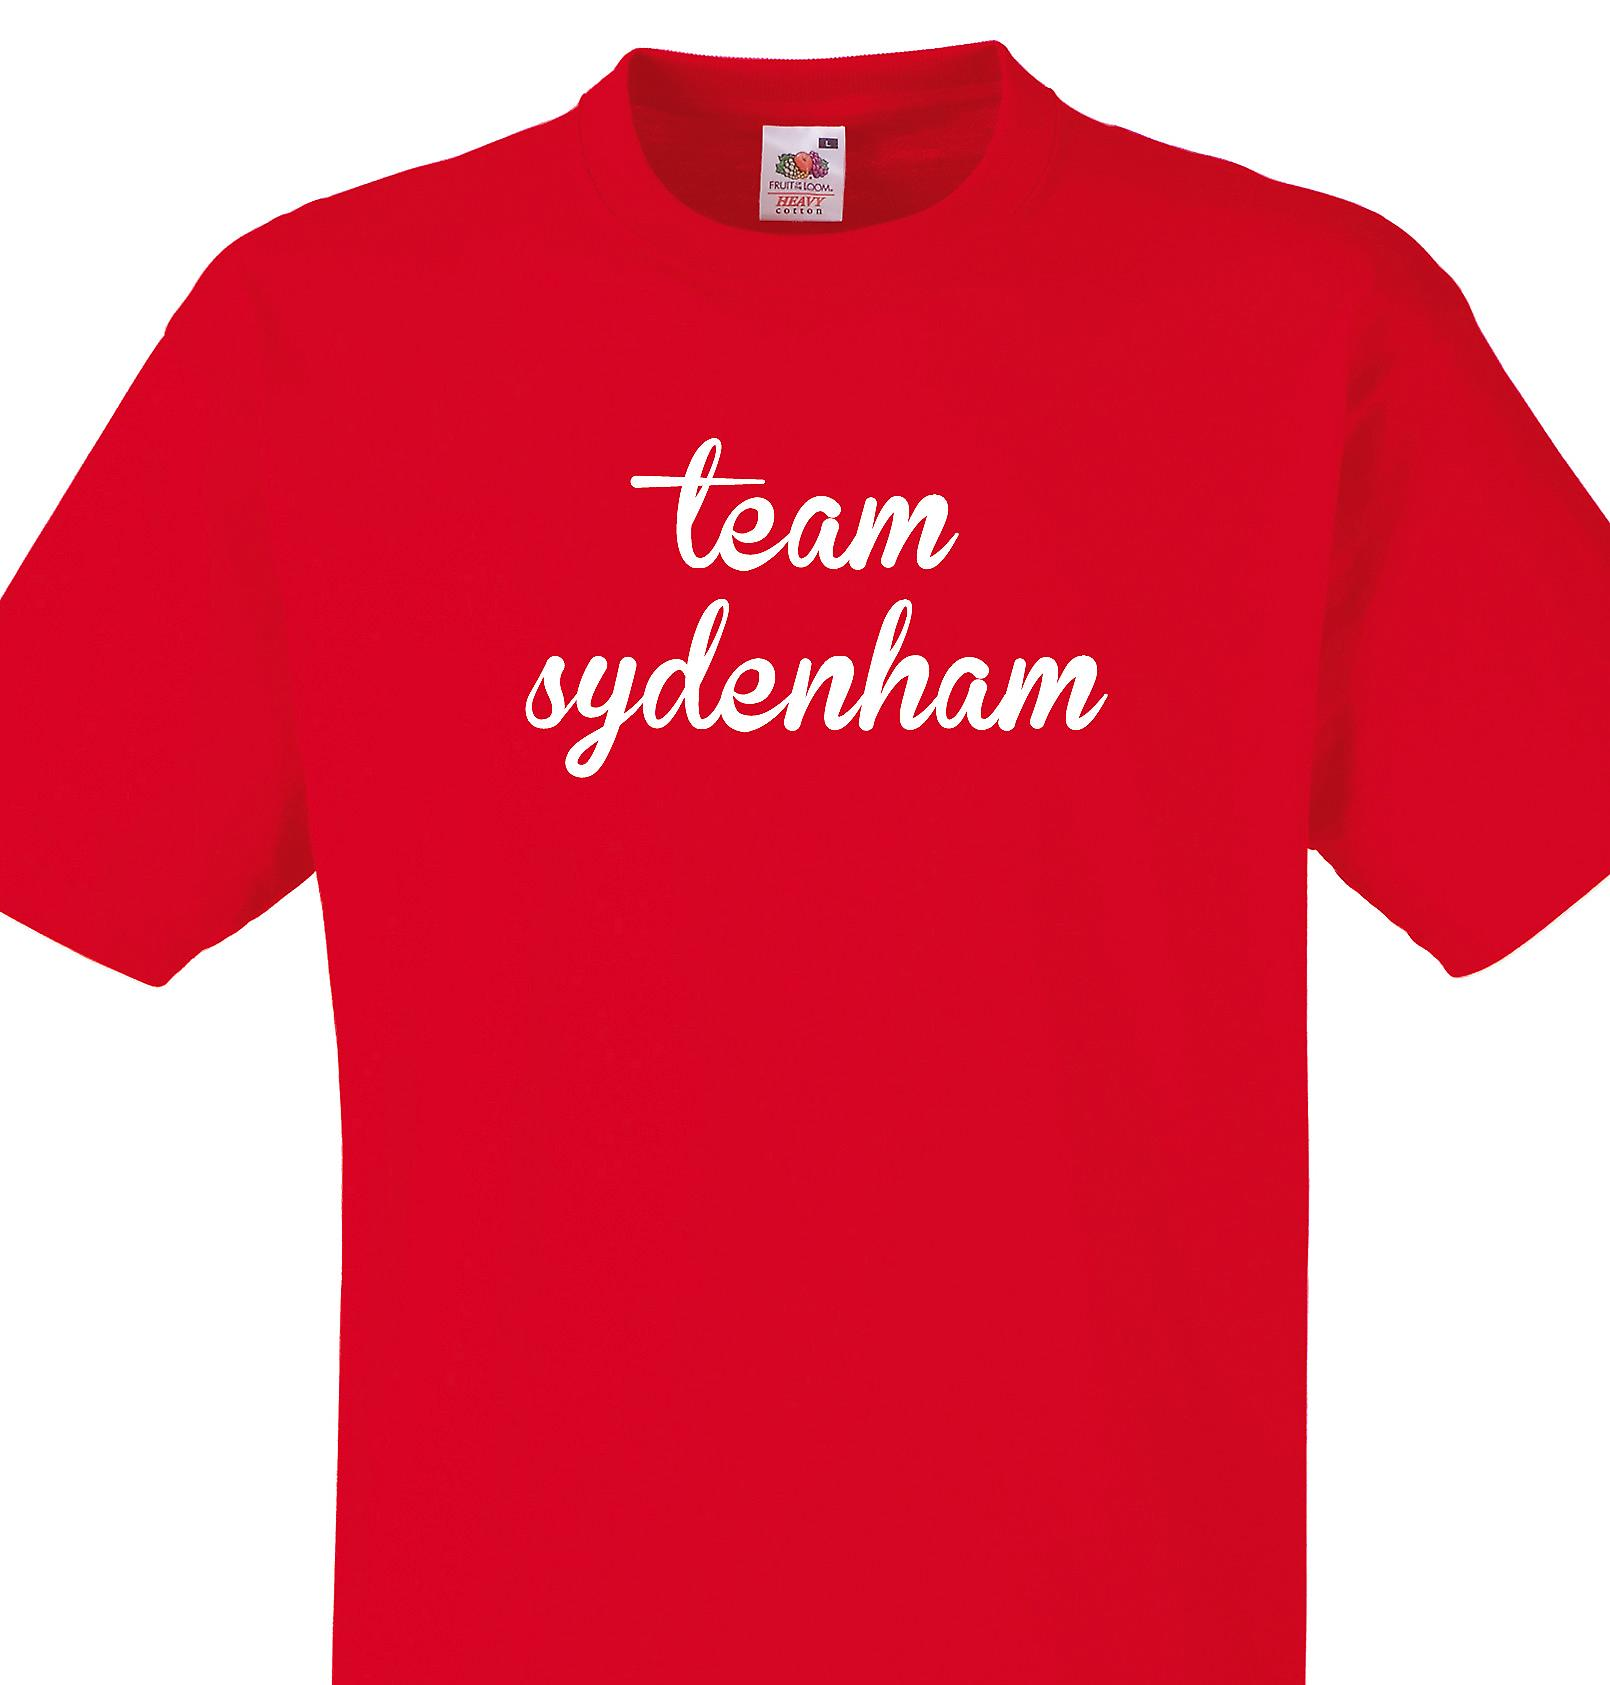 Team Sydenham Red T shirt